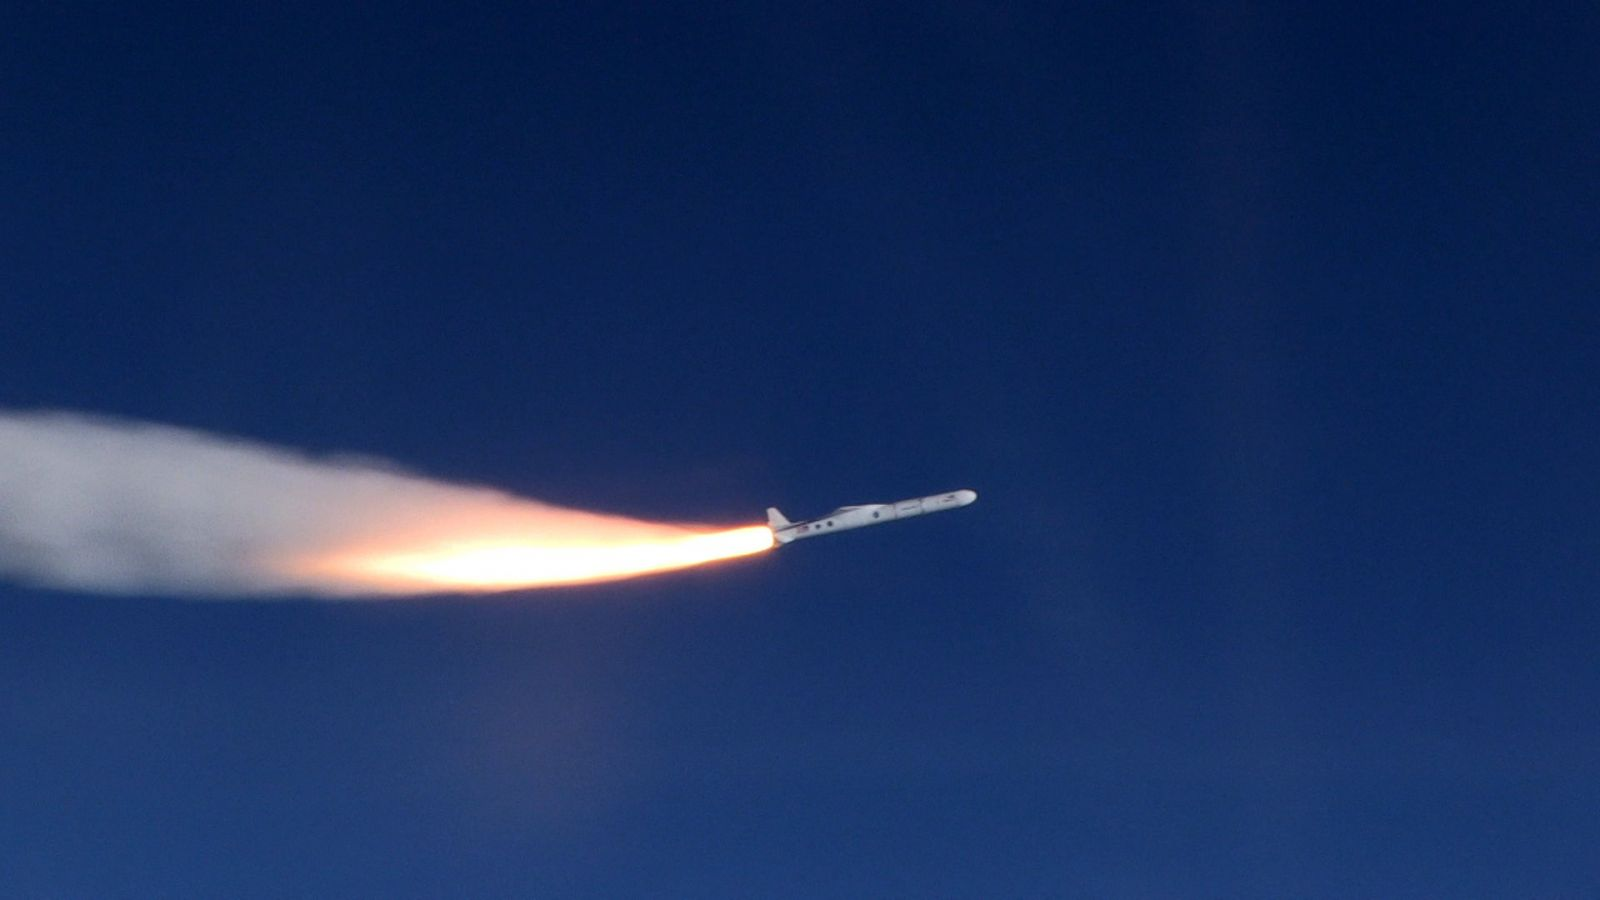 orbital atk pegasus launches cygnss hurricane watching satellites